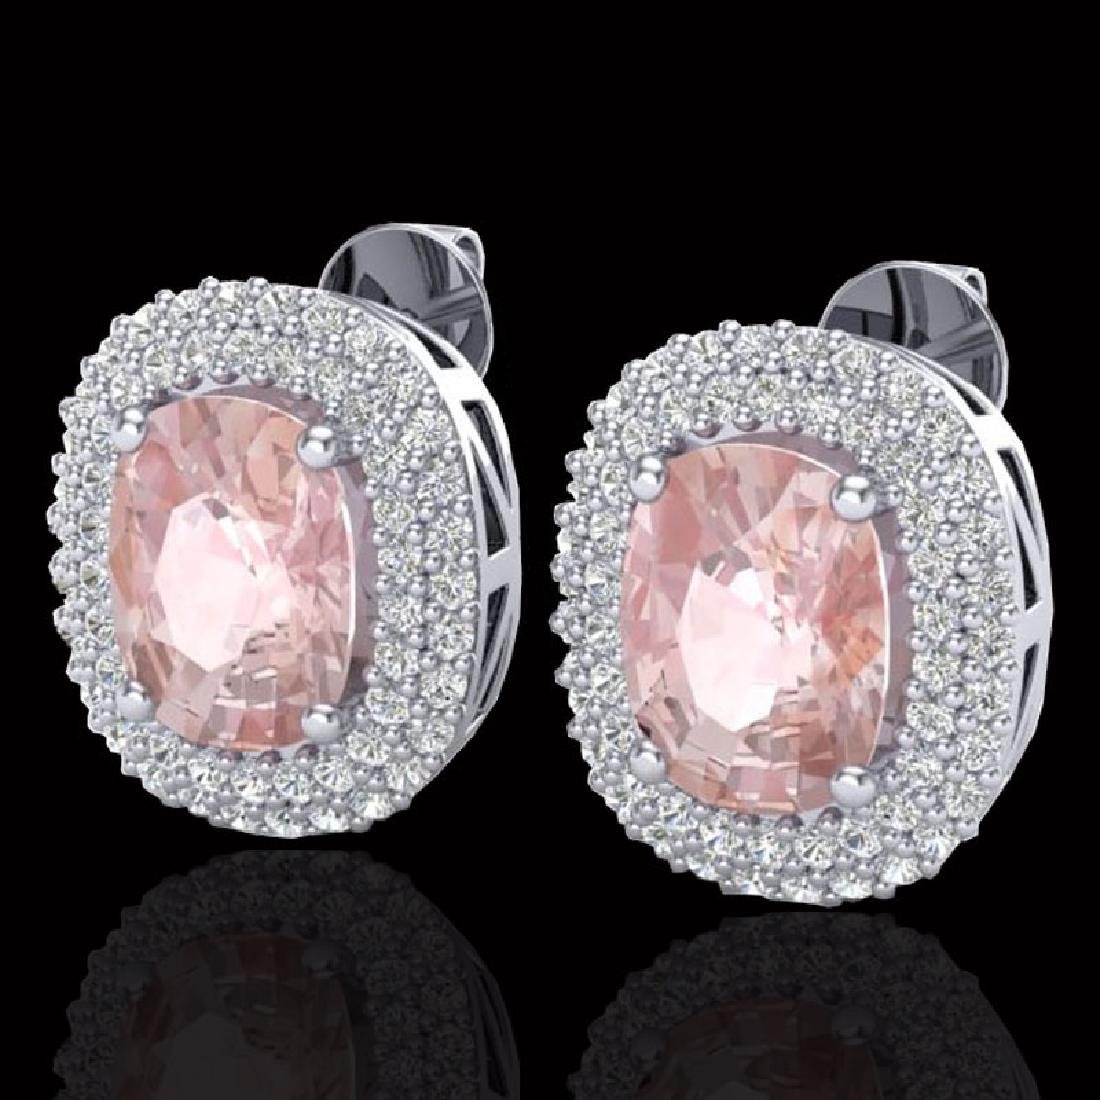 5.50 CTW Morganite & Micro Pave VS/SI Diamond Halo